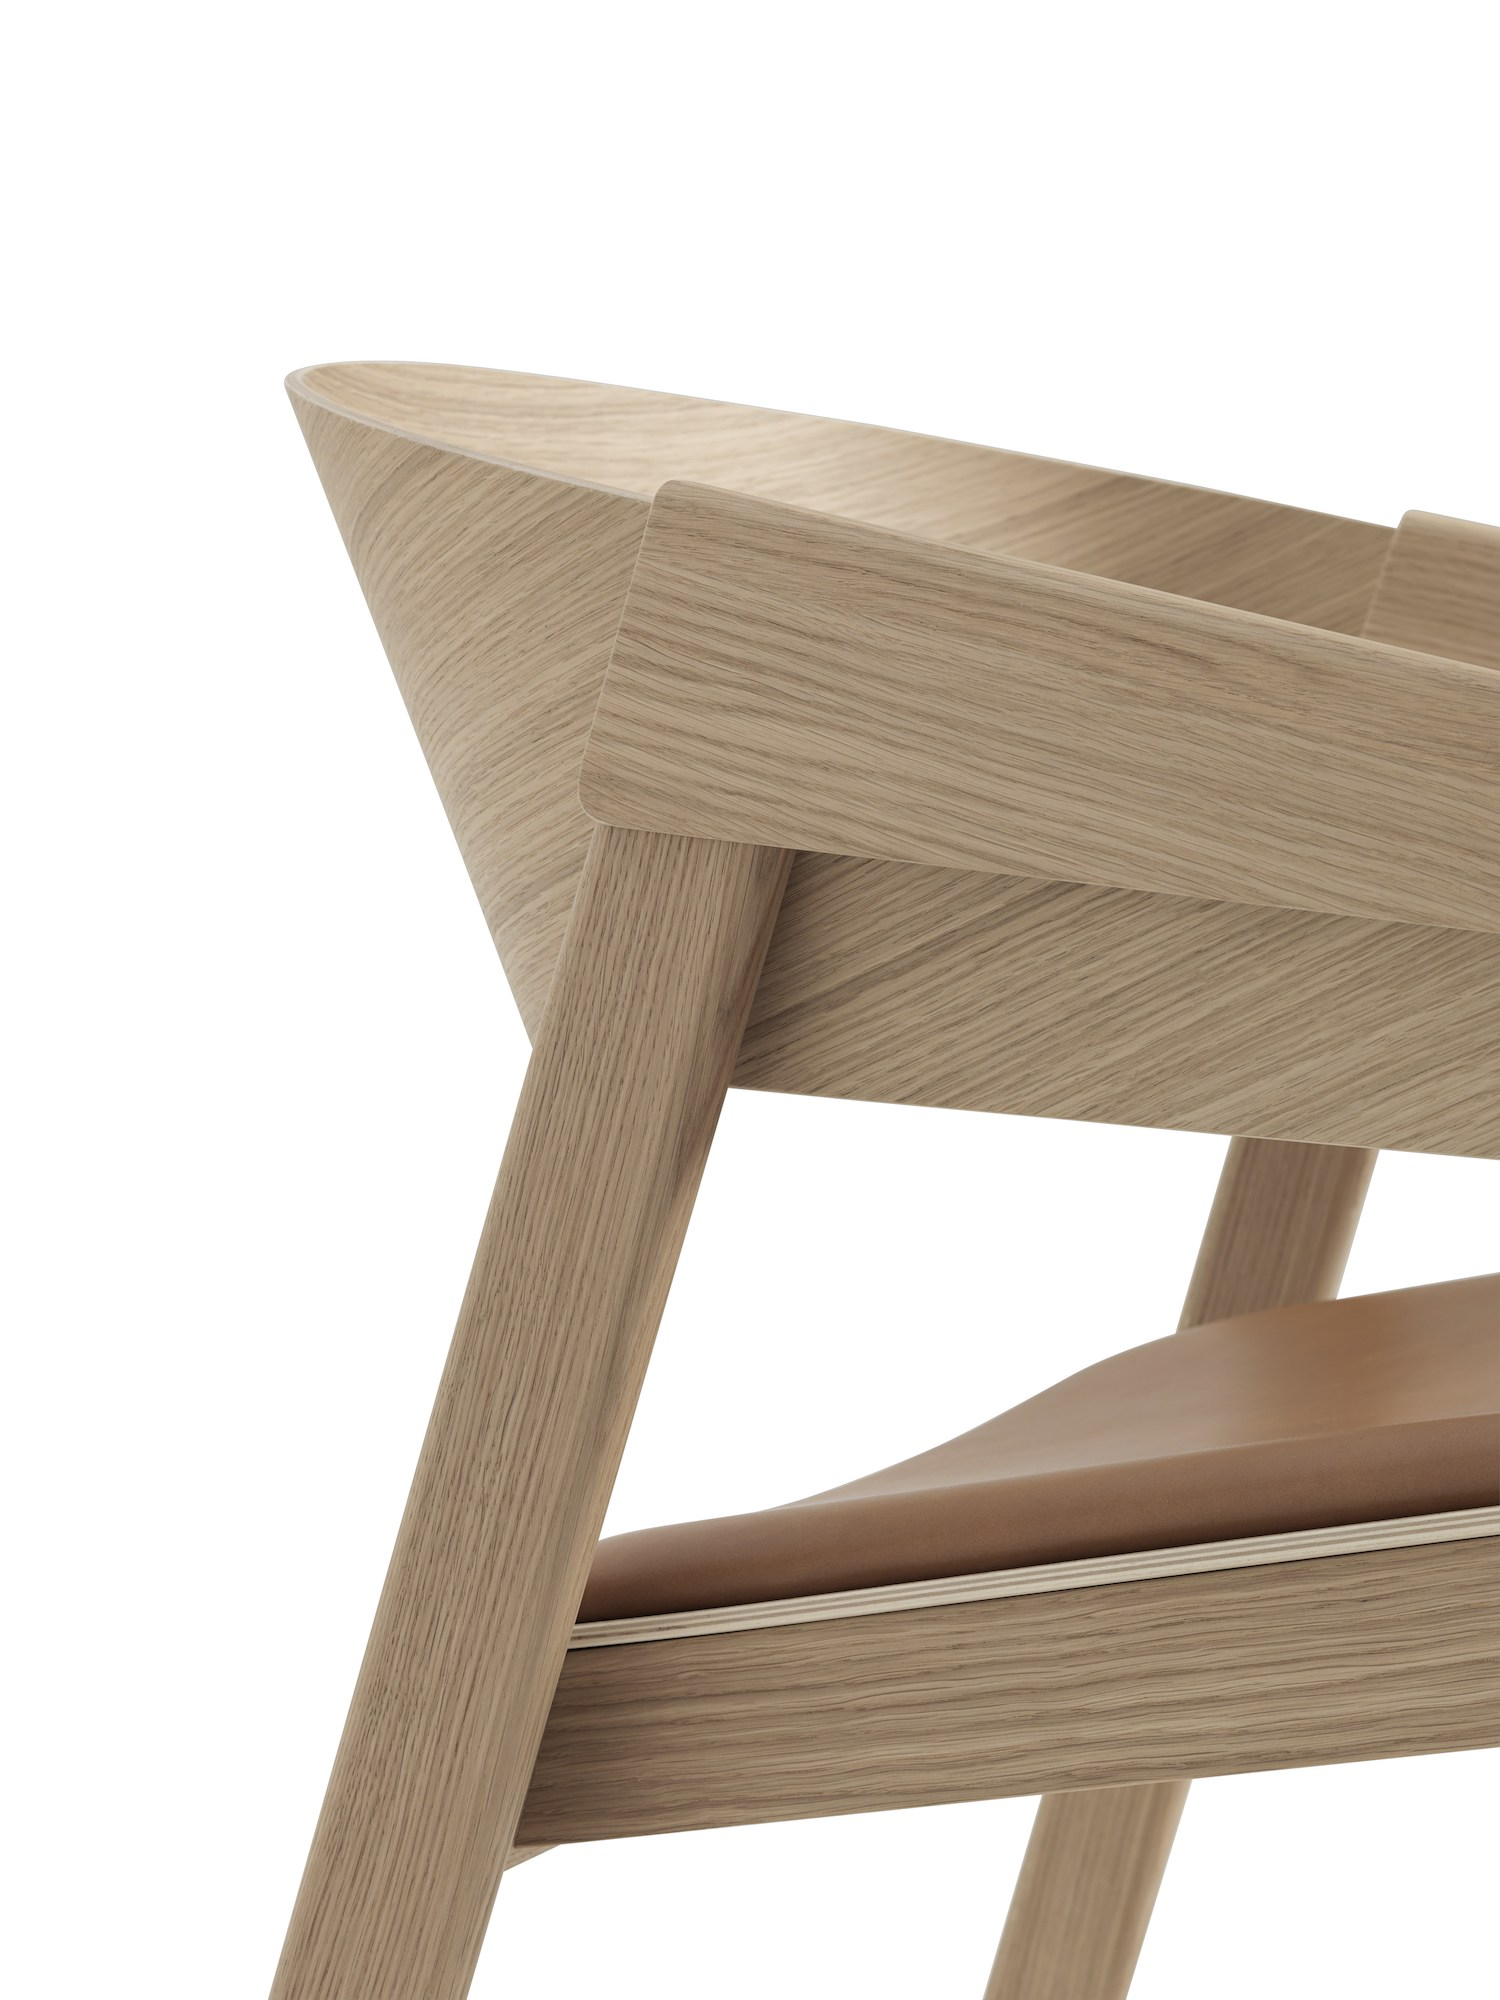 Muuto Cover Lounge Chair Design Thomas Benzen 2019